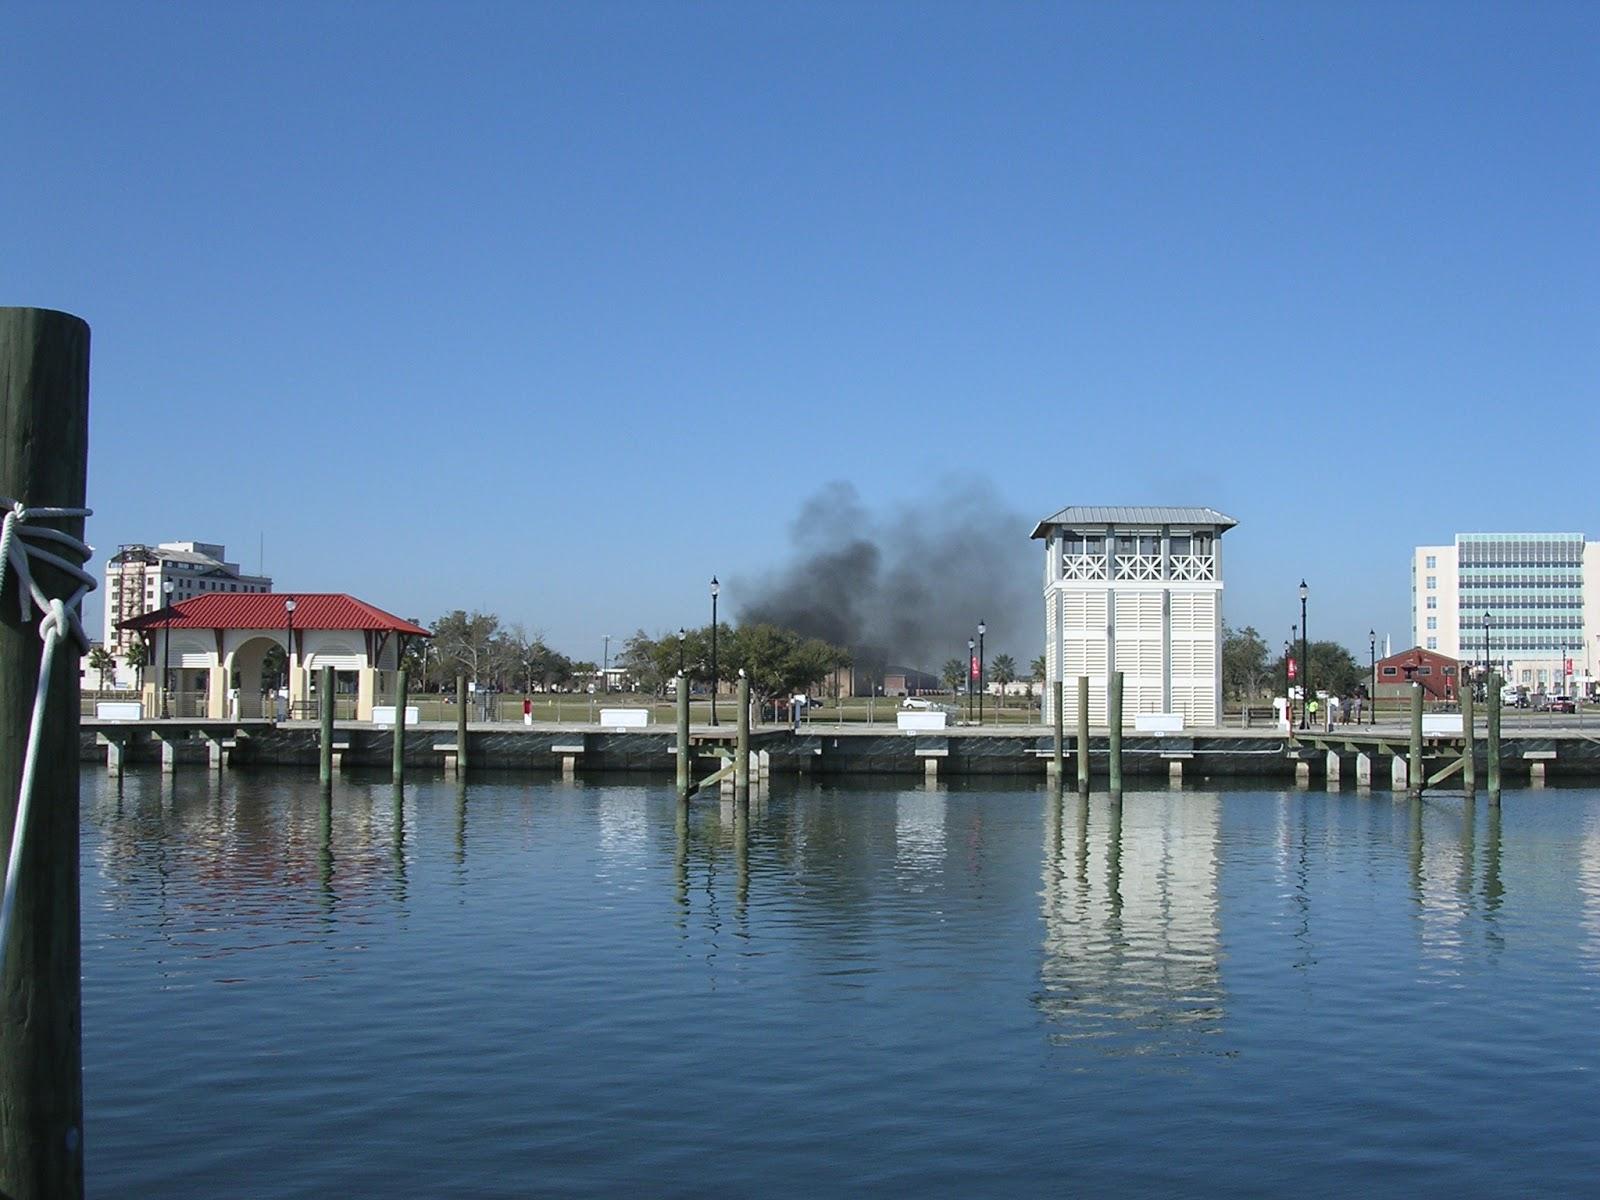 S/V La Strada: Gulfport Small Craft Harbor Gulfport, MS